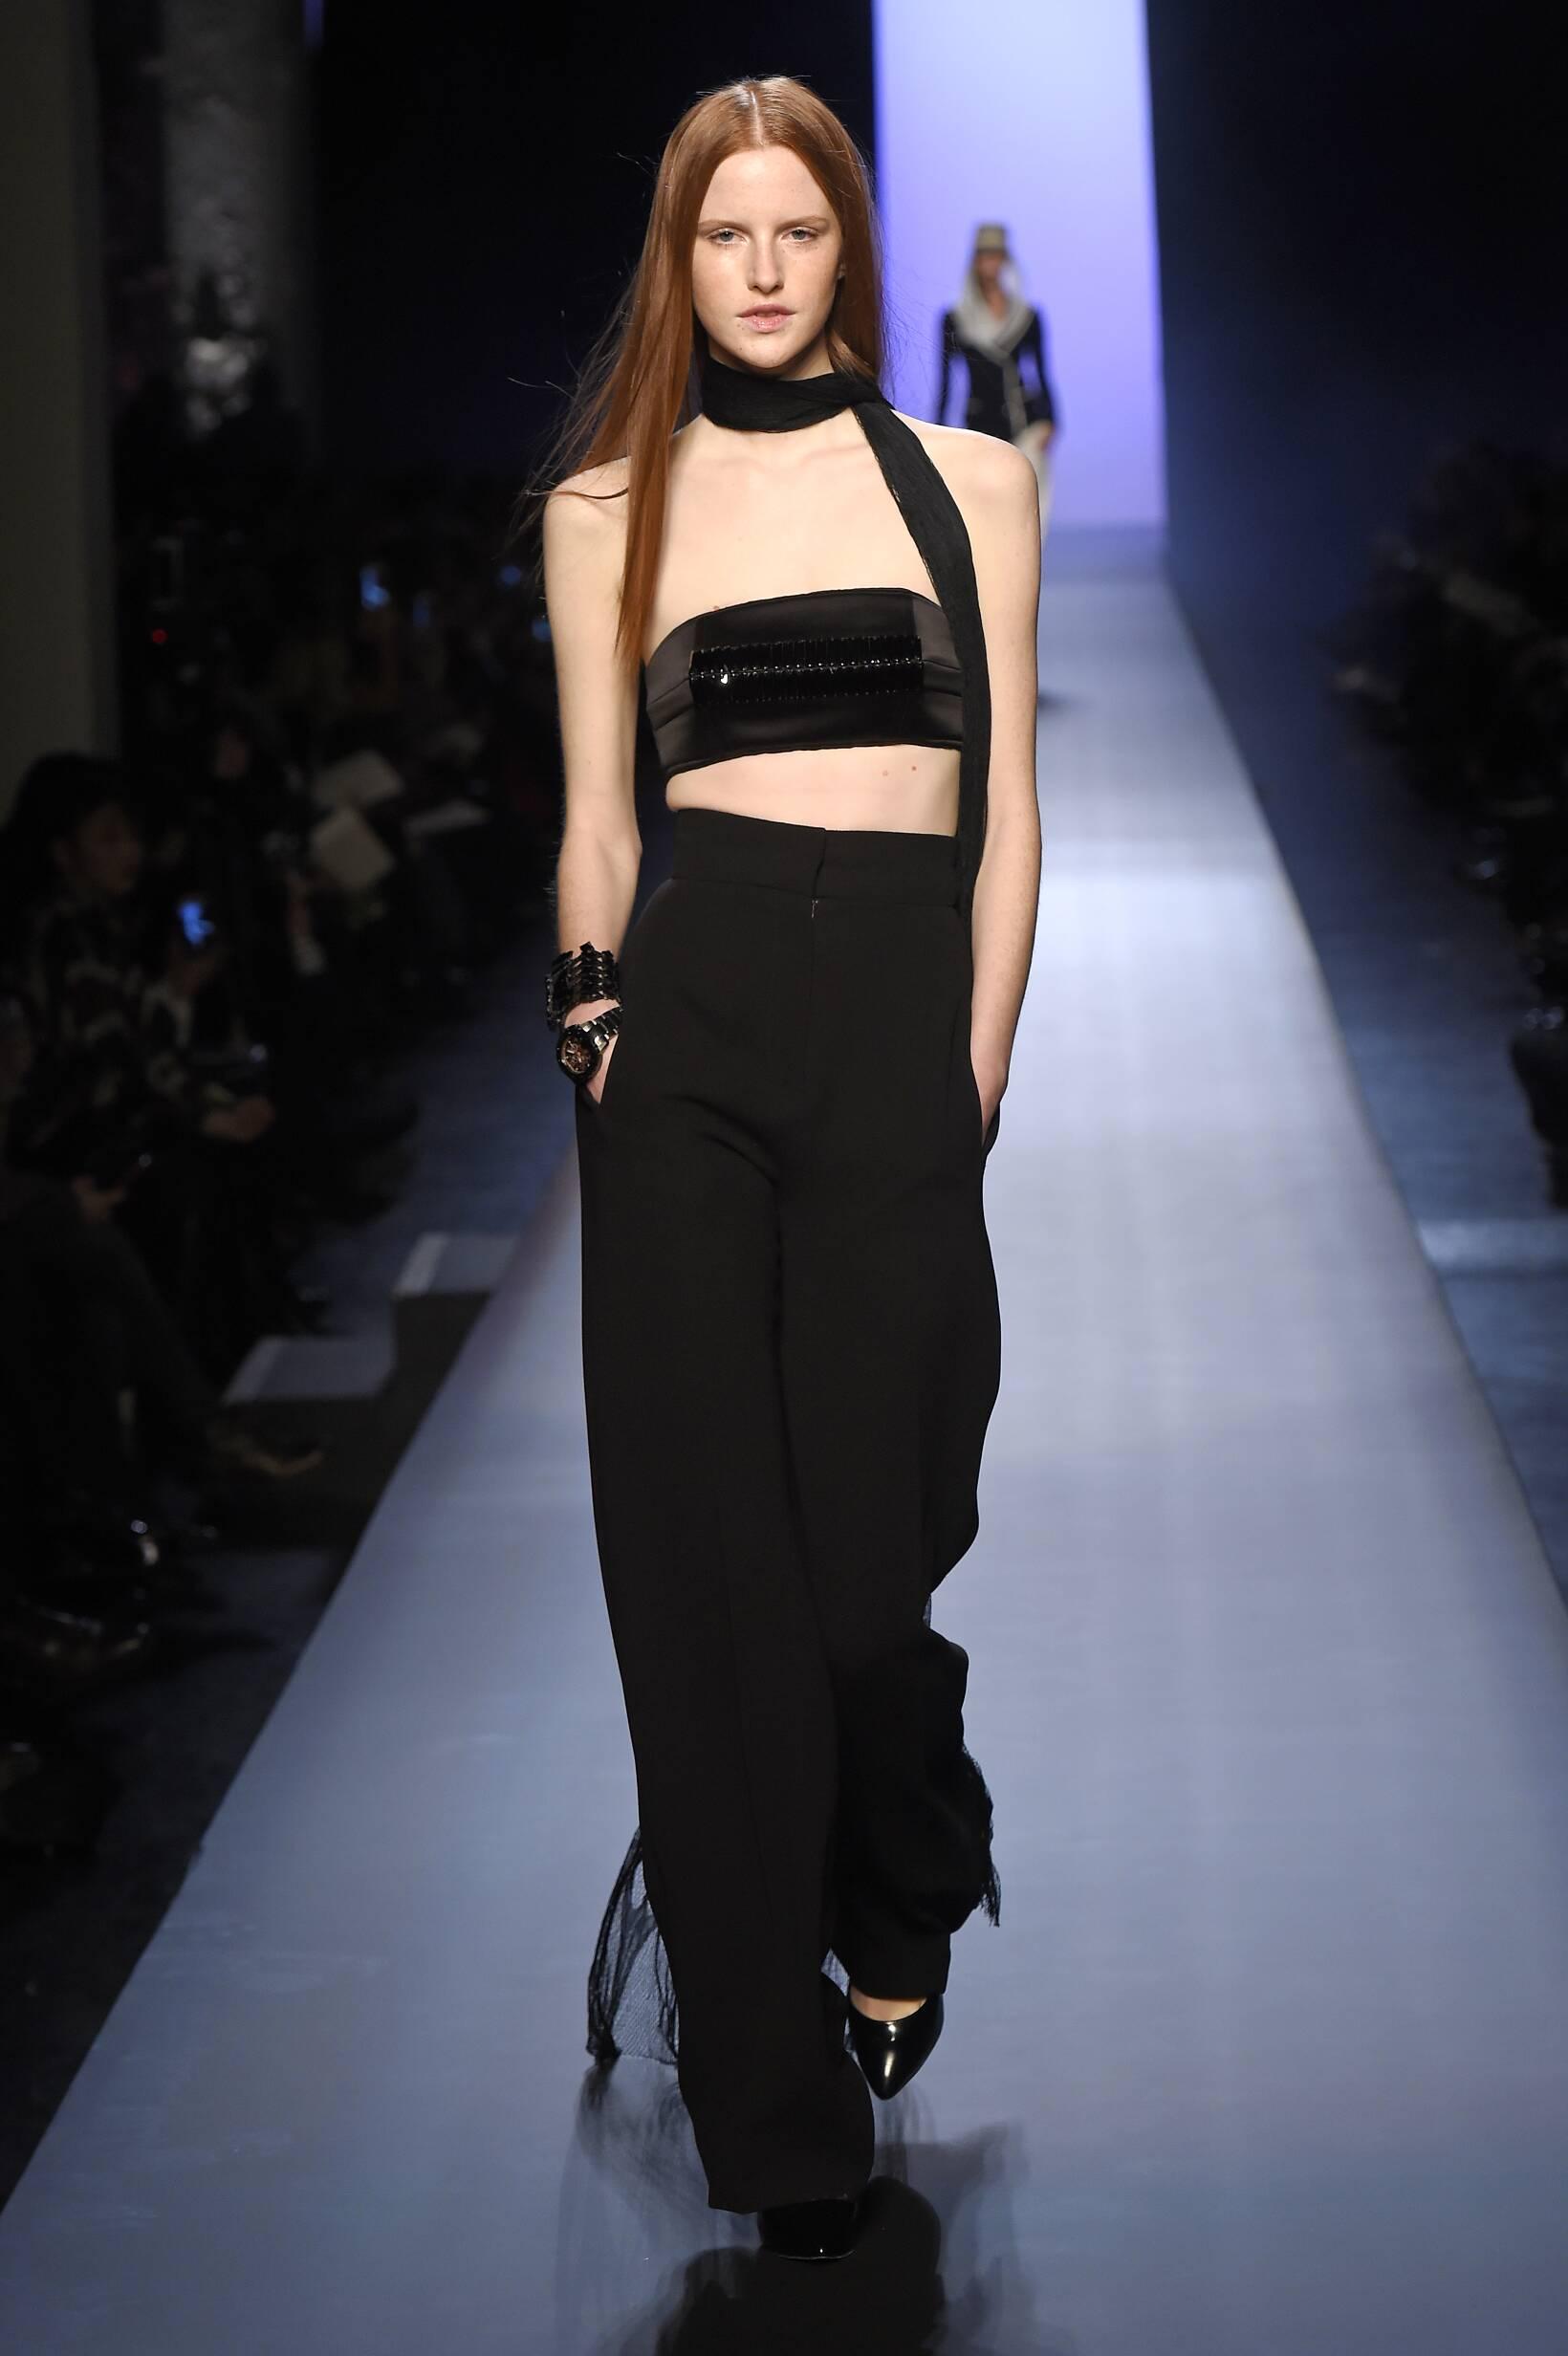 Jean Paul Gaultier Haute Couture Spring Summer 2015 Women's Collection Paris Fashion Week Fashion Show